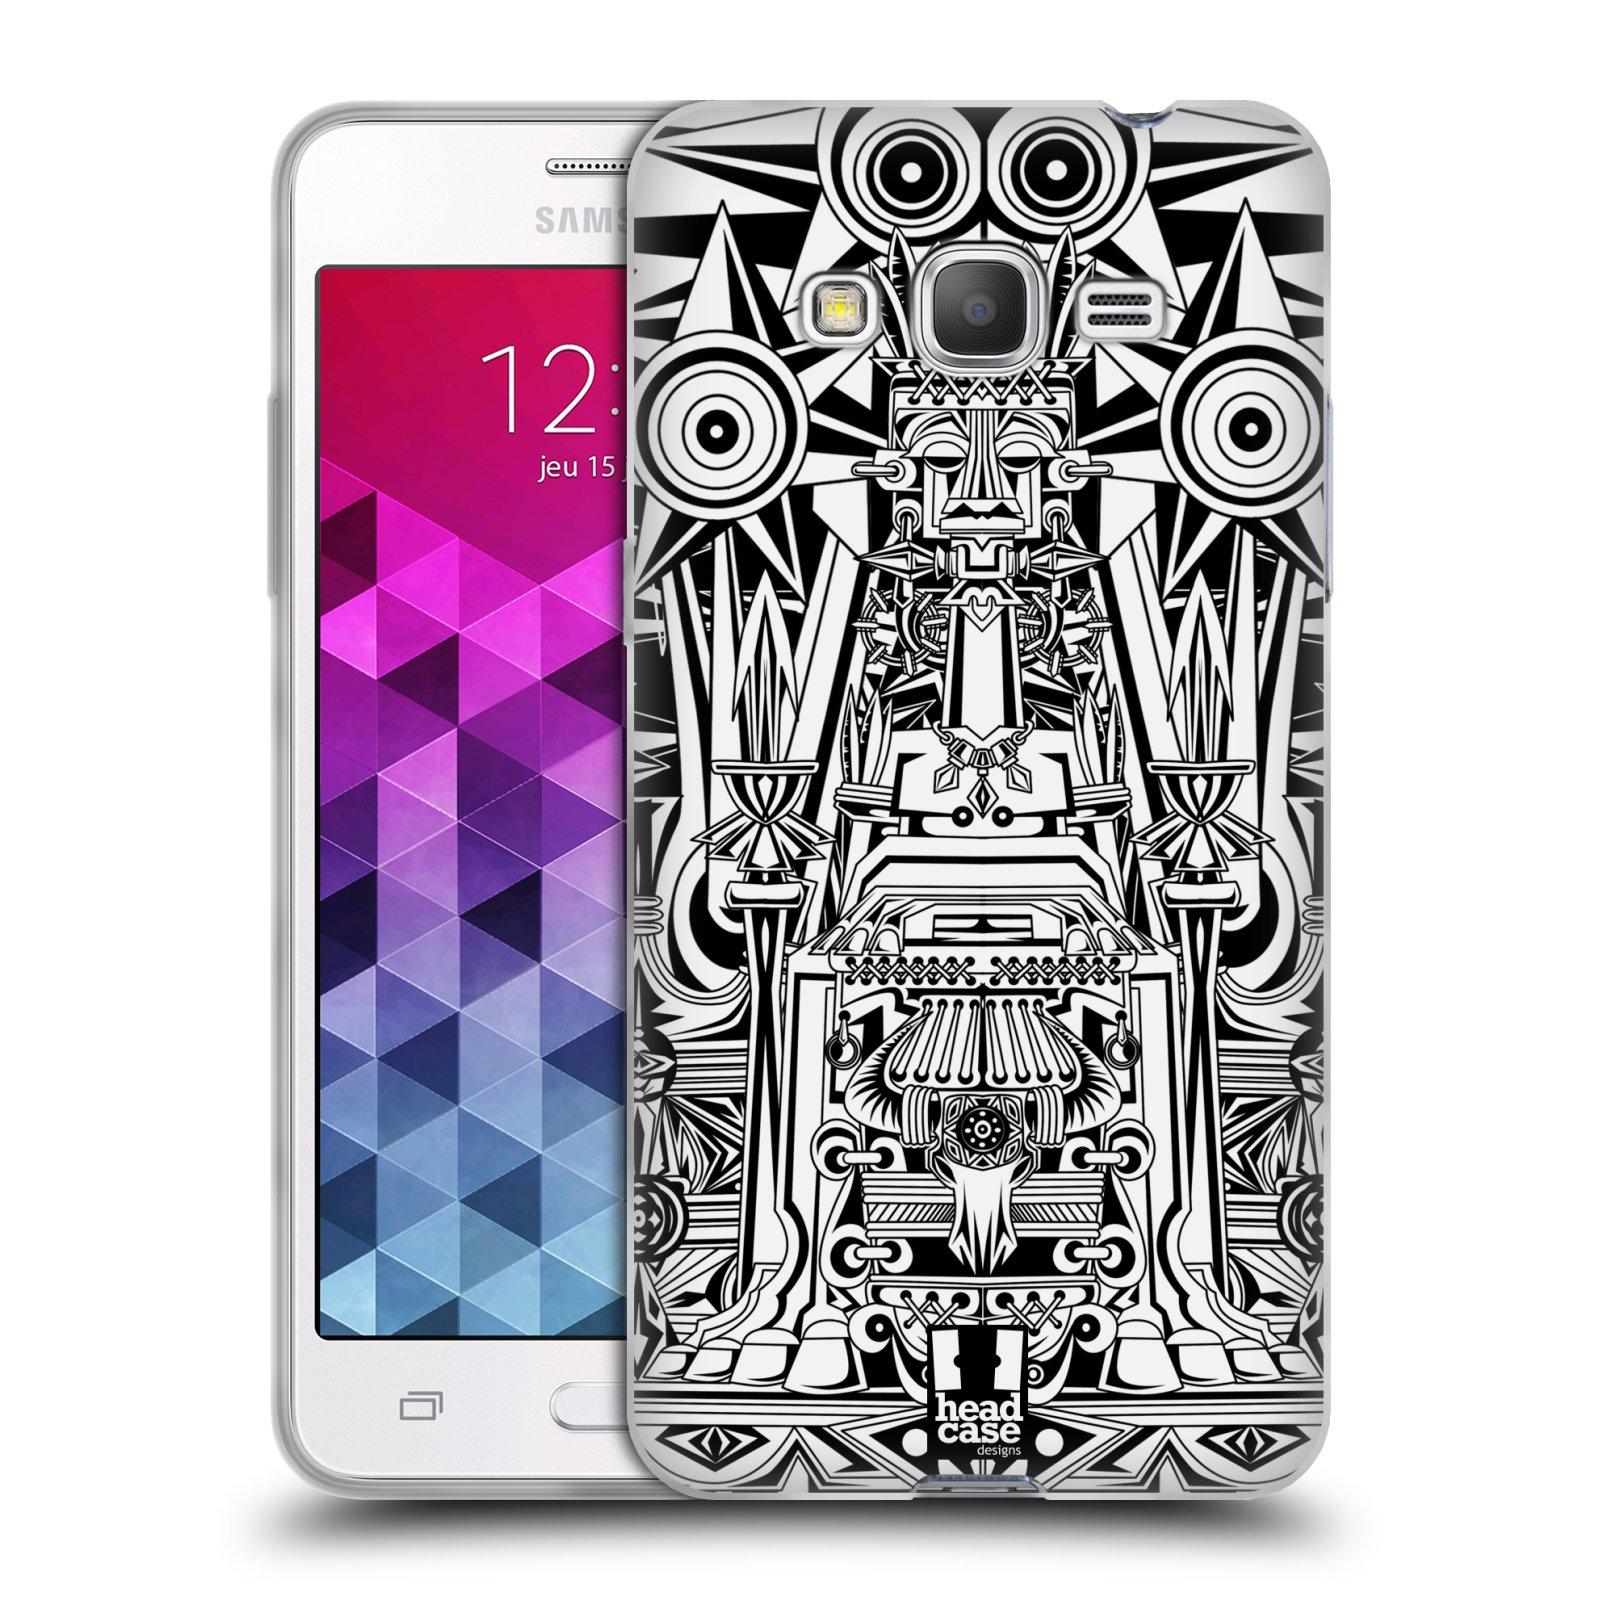 Silikonové pouzdro na mobil Samsung Galaxy Grand Prime VE HEAD CASE BULOL BADJAO